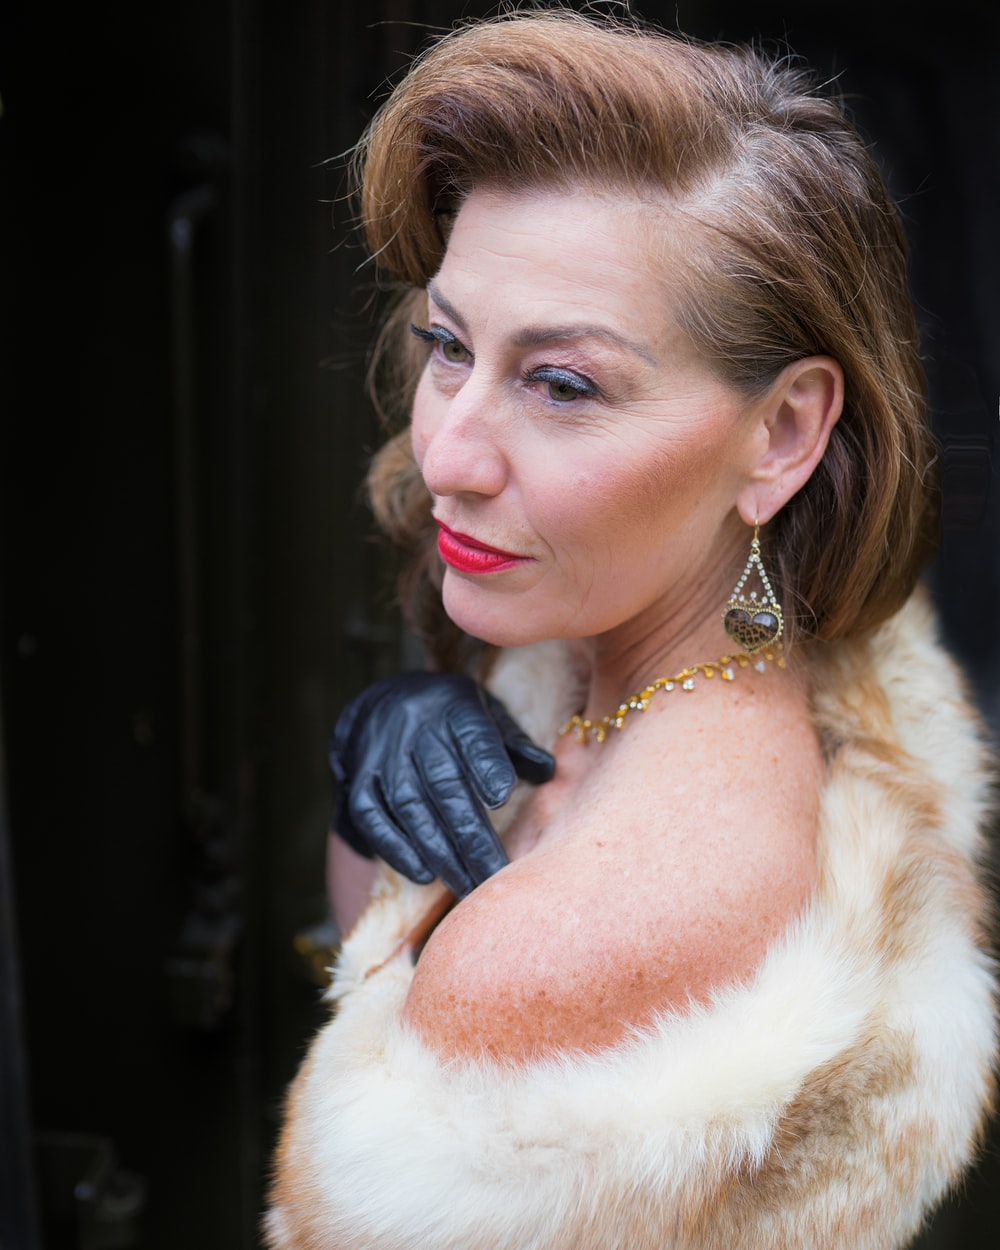 woman wearing white and tan fur top